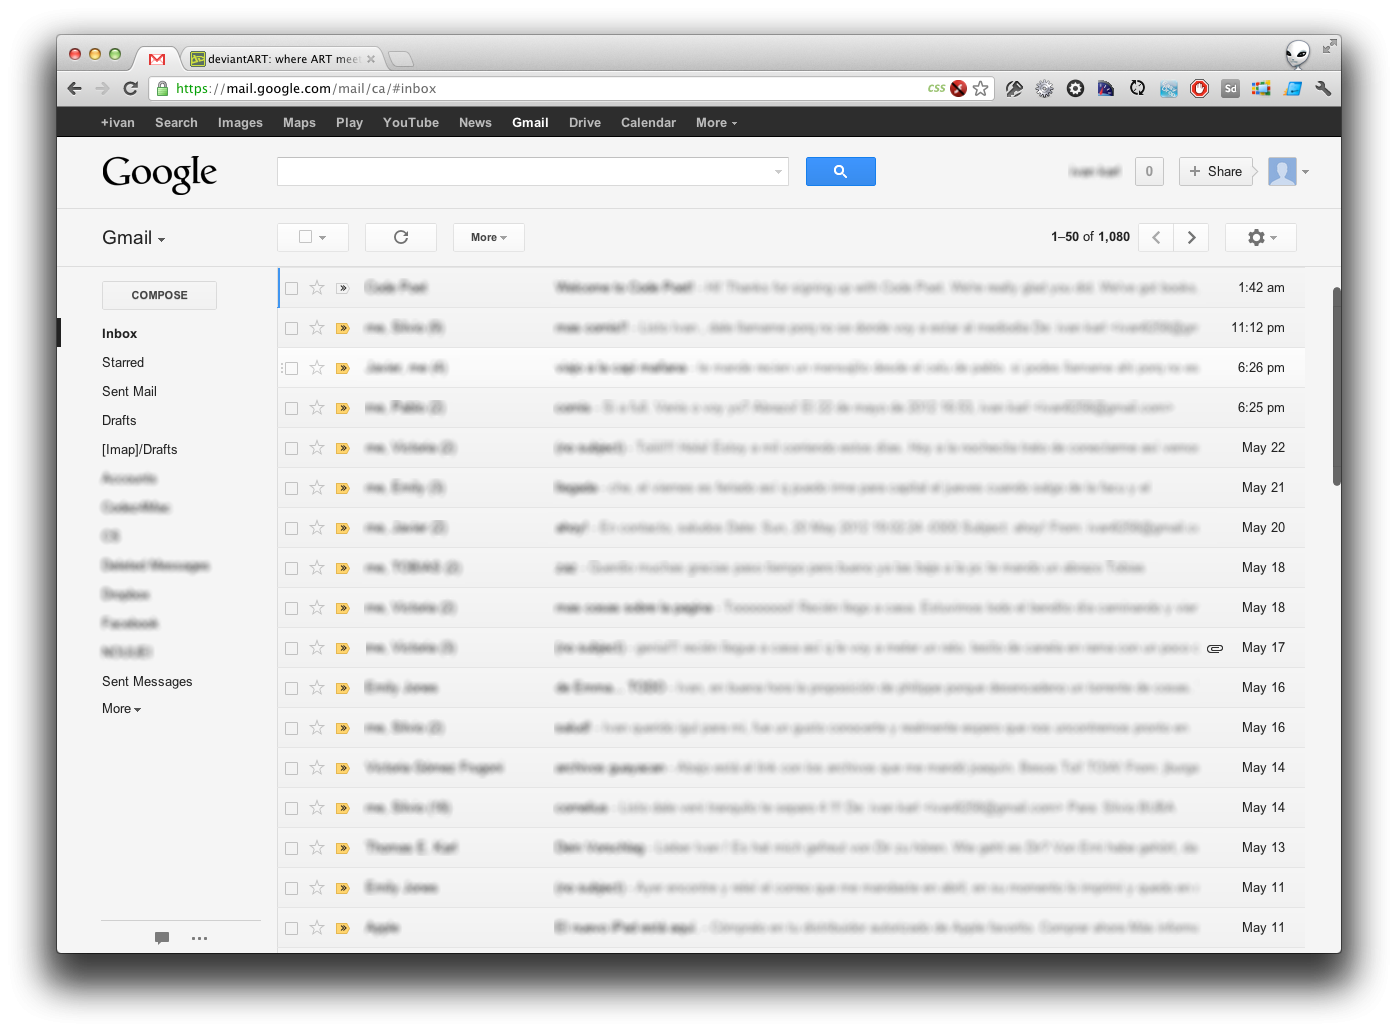 Gmail theme css - Gmail Gray Theme By Farfanoide Gmail Gray Theme By Farfanoide